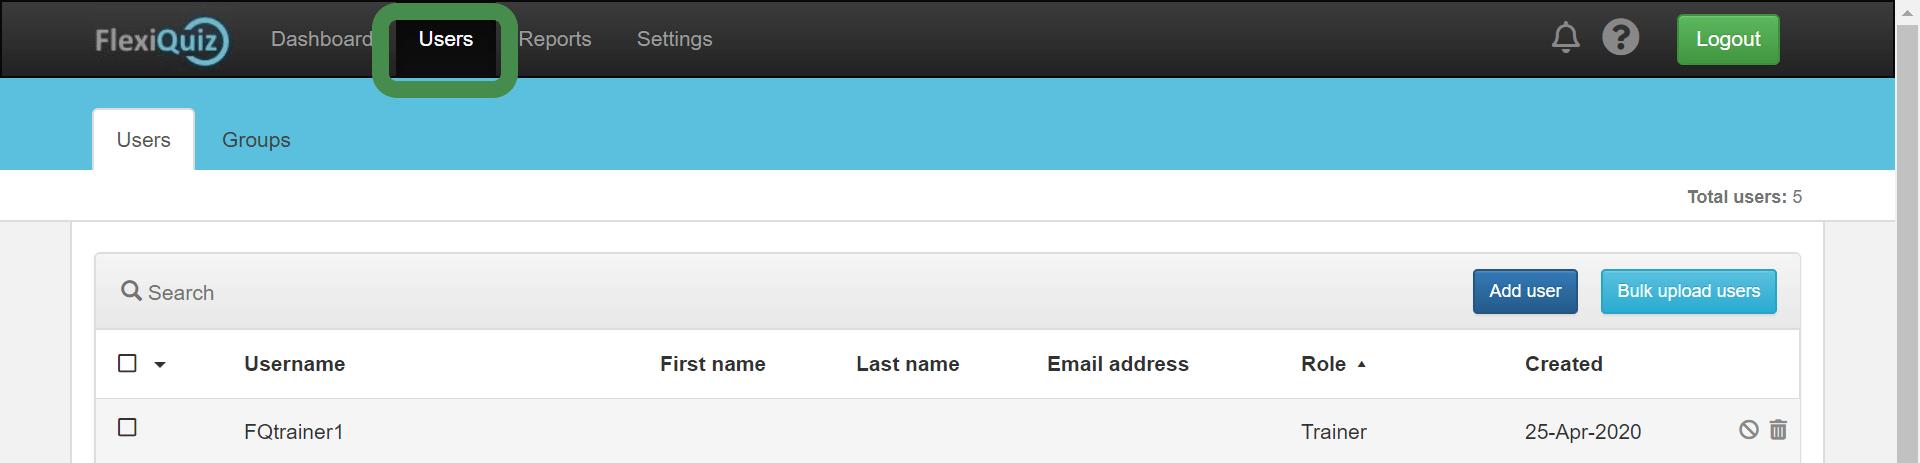 FlexiQuiz users dashboard